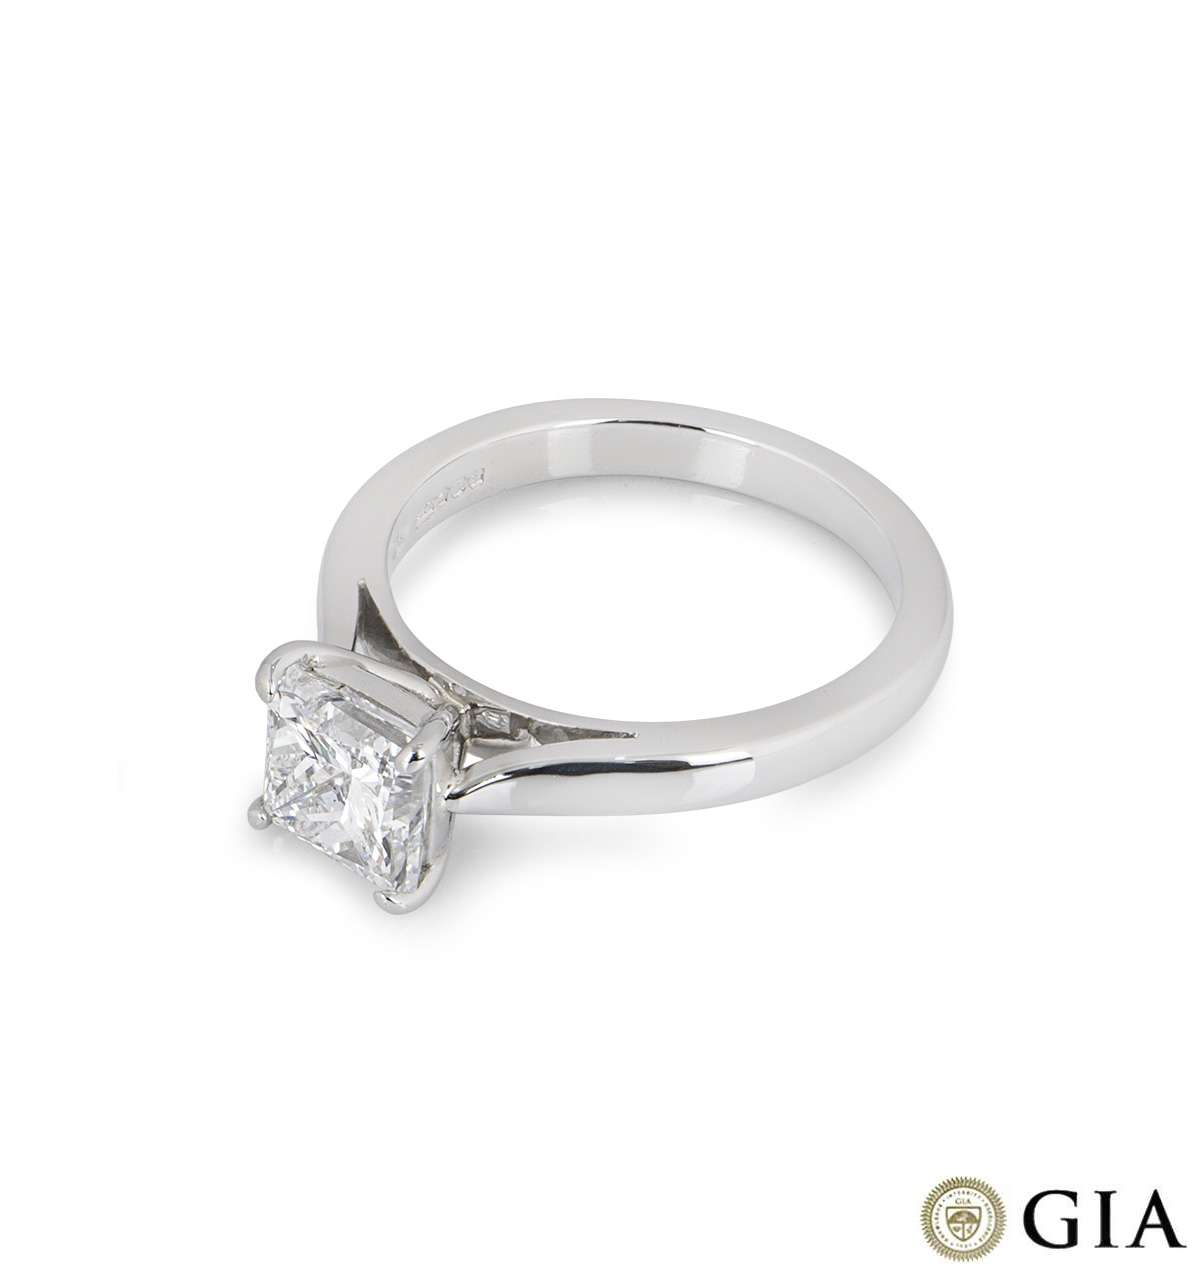 Platinum Princess Cut Diamond Ring 1.51ct F/VS2